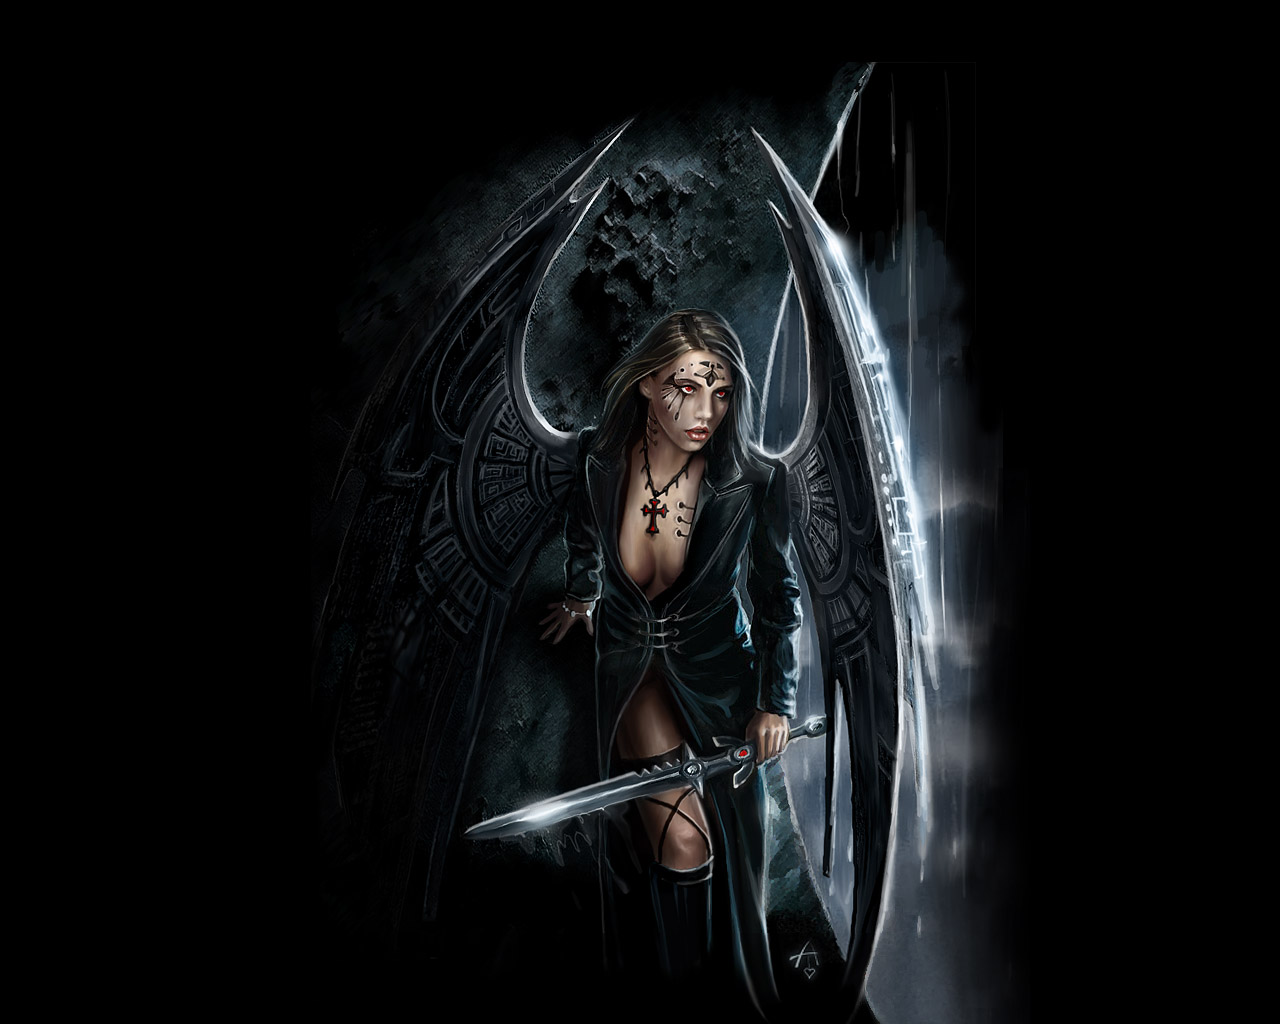 Gothic Dark Wallpapers   Download Dark Gothic Backgrounds 1280x1024